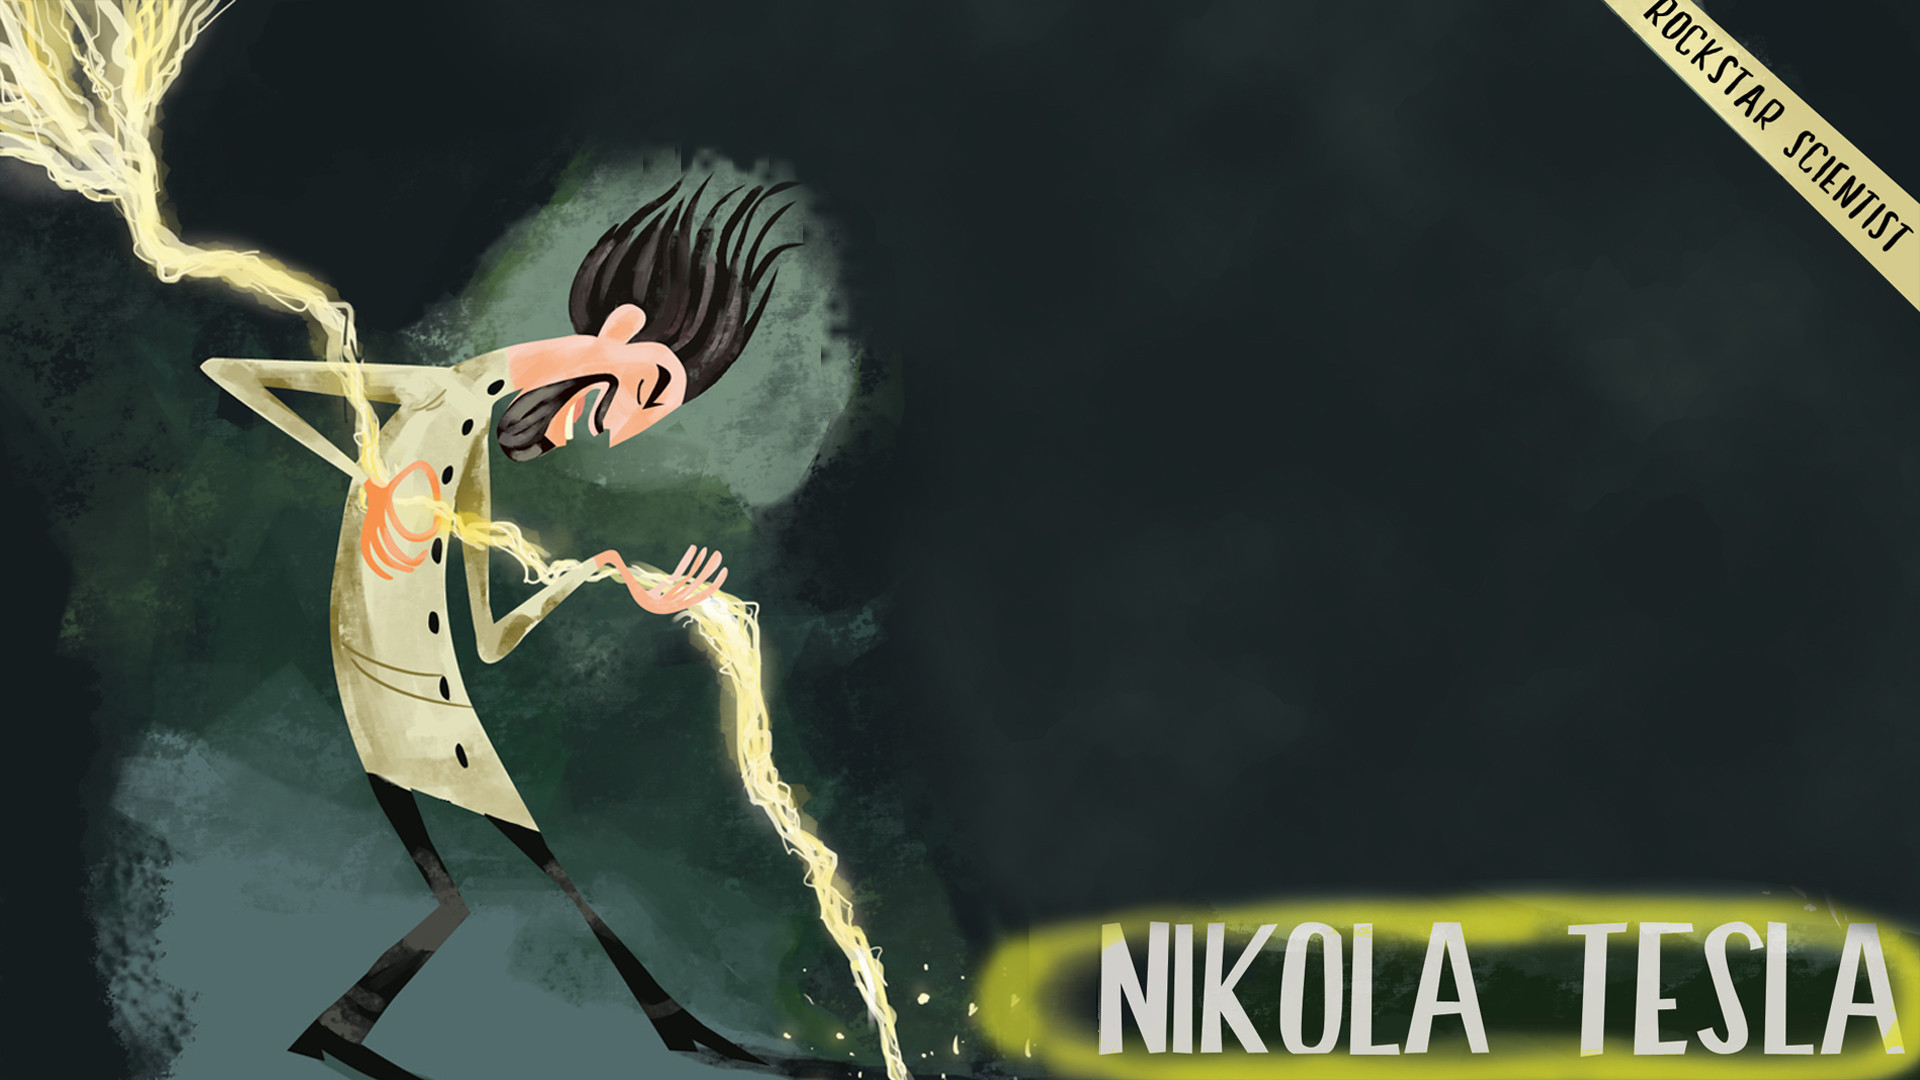 nikola tesla wallpaper hd 67 images